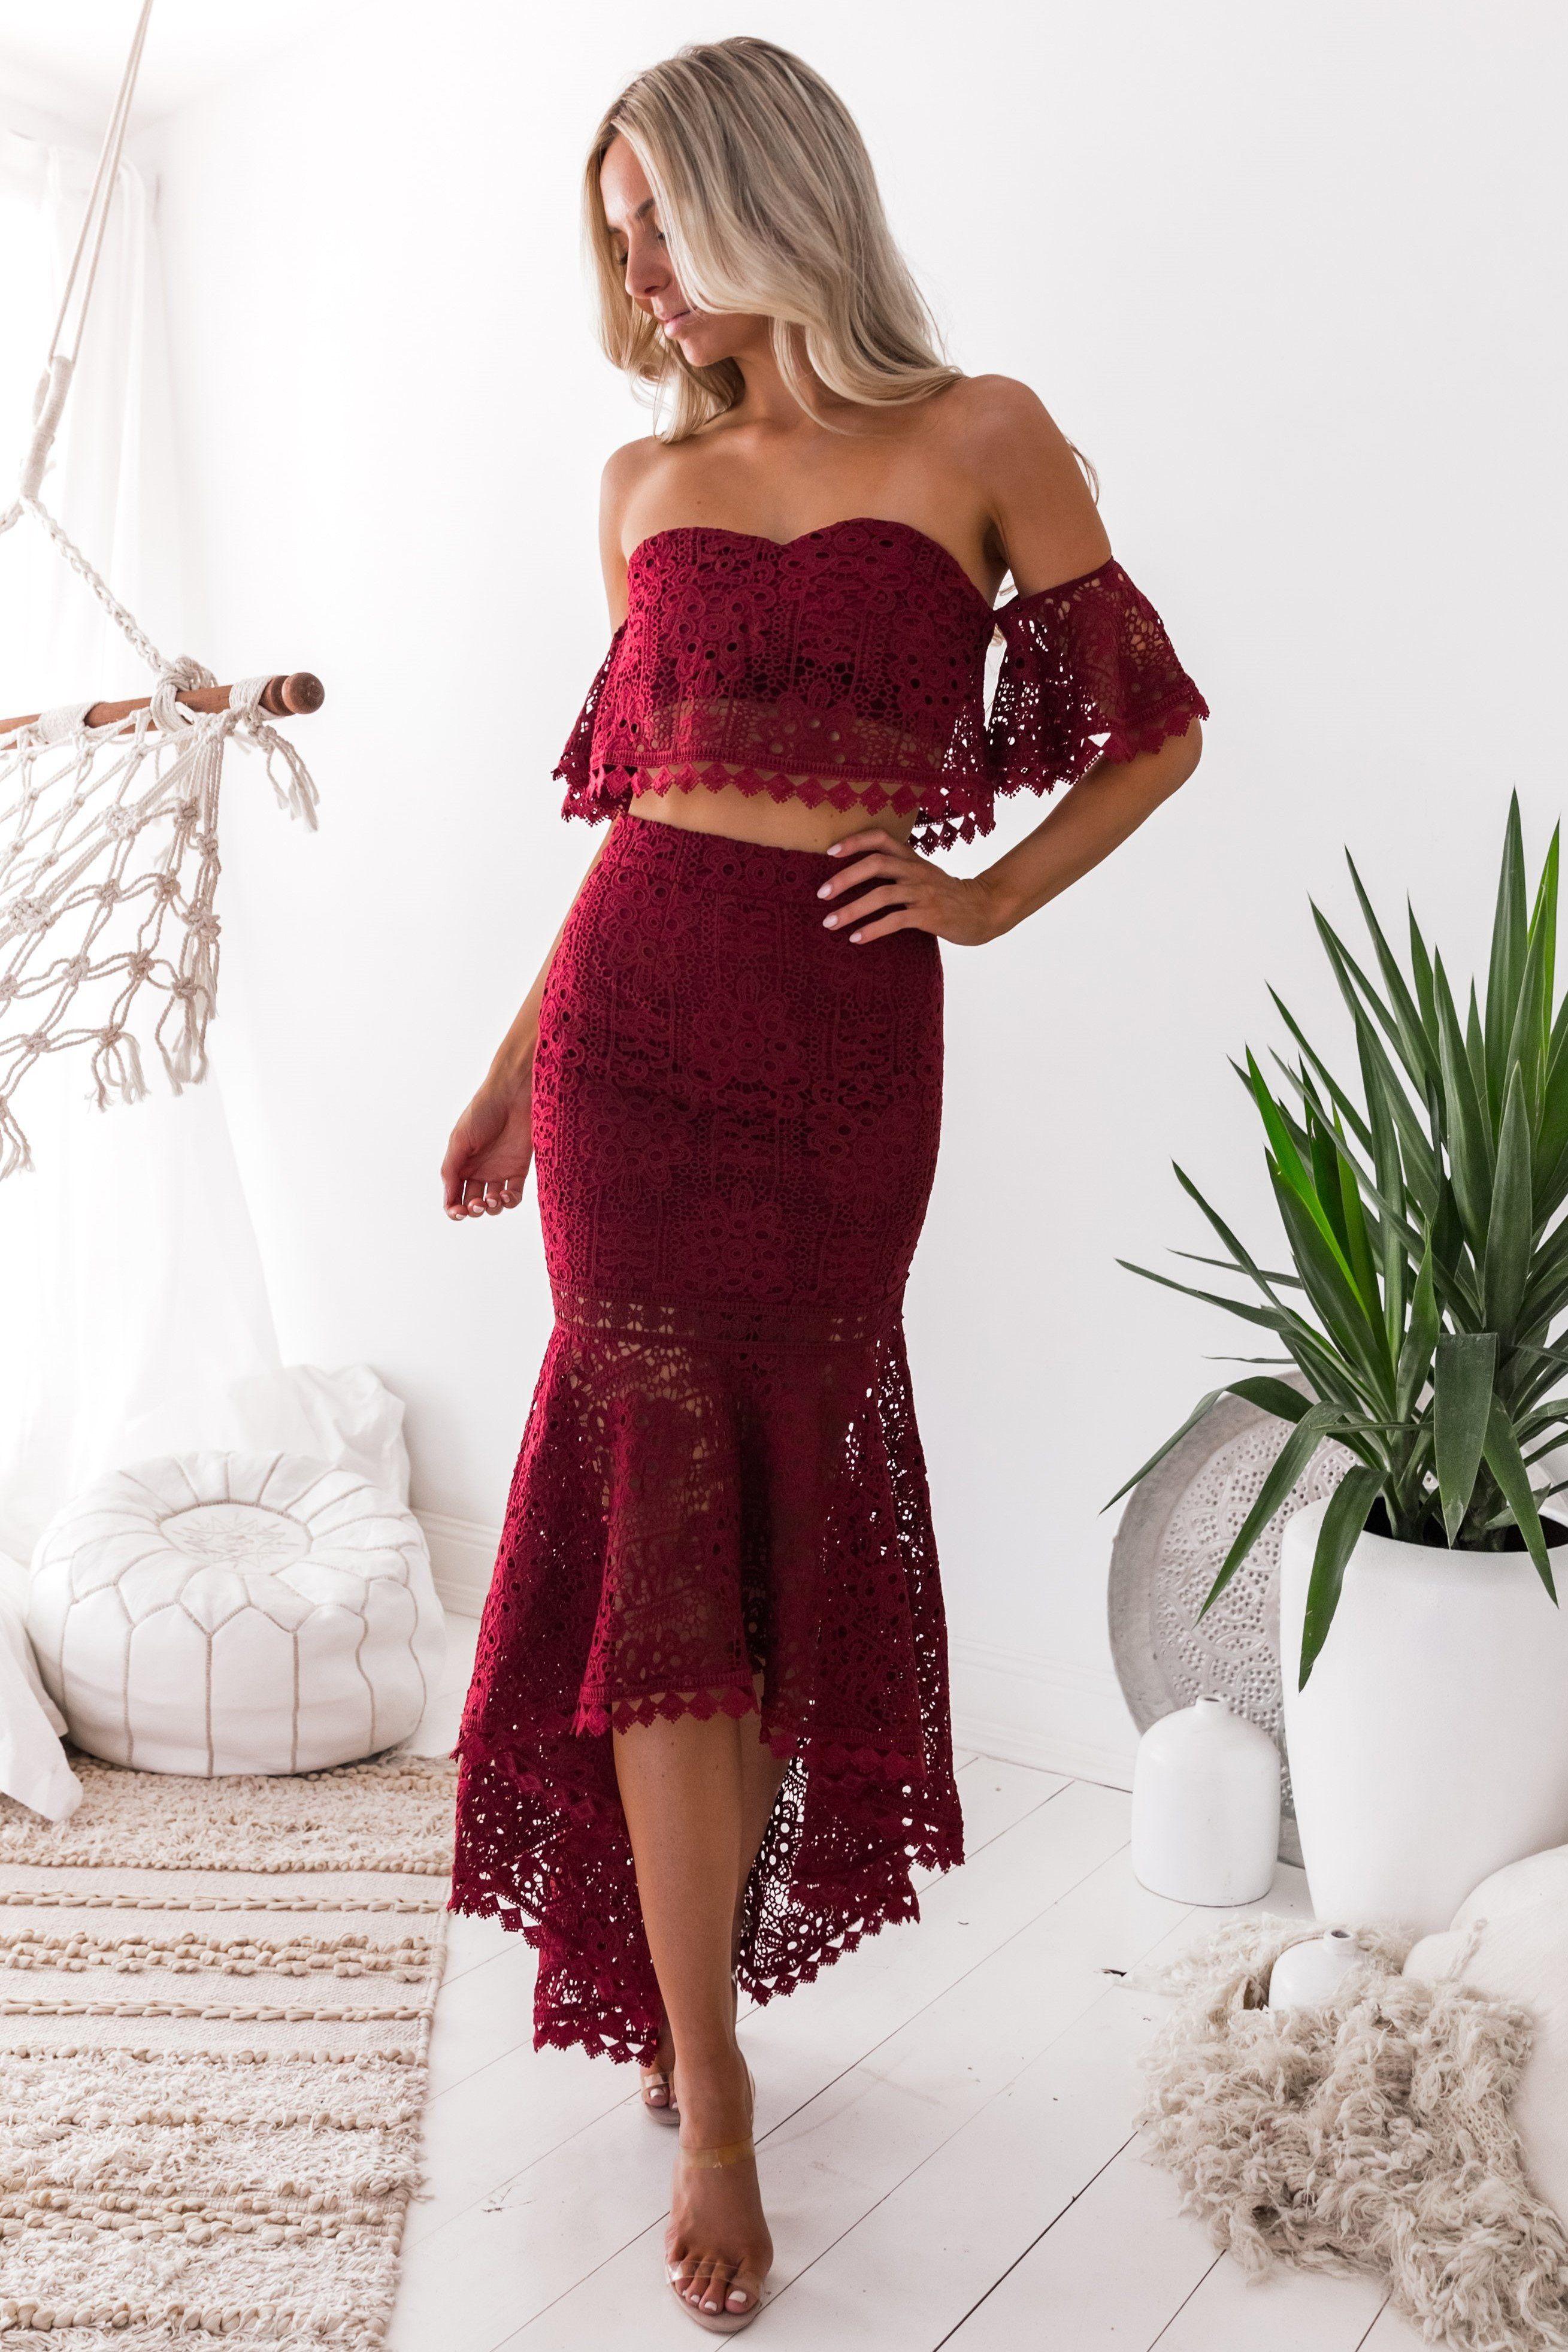 Celine Set Burgundy Burgundy Prom Dress Prom Dresses Two Piece Lace Party Dresses [ 3927 x 2618 Pixel ]